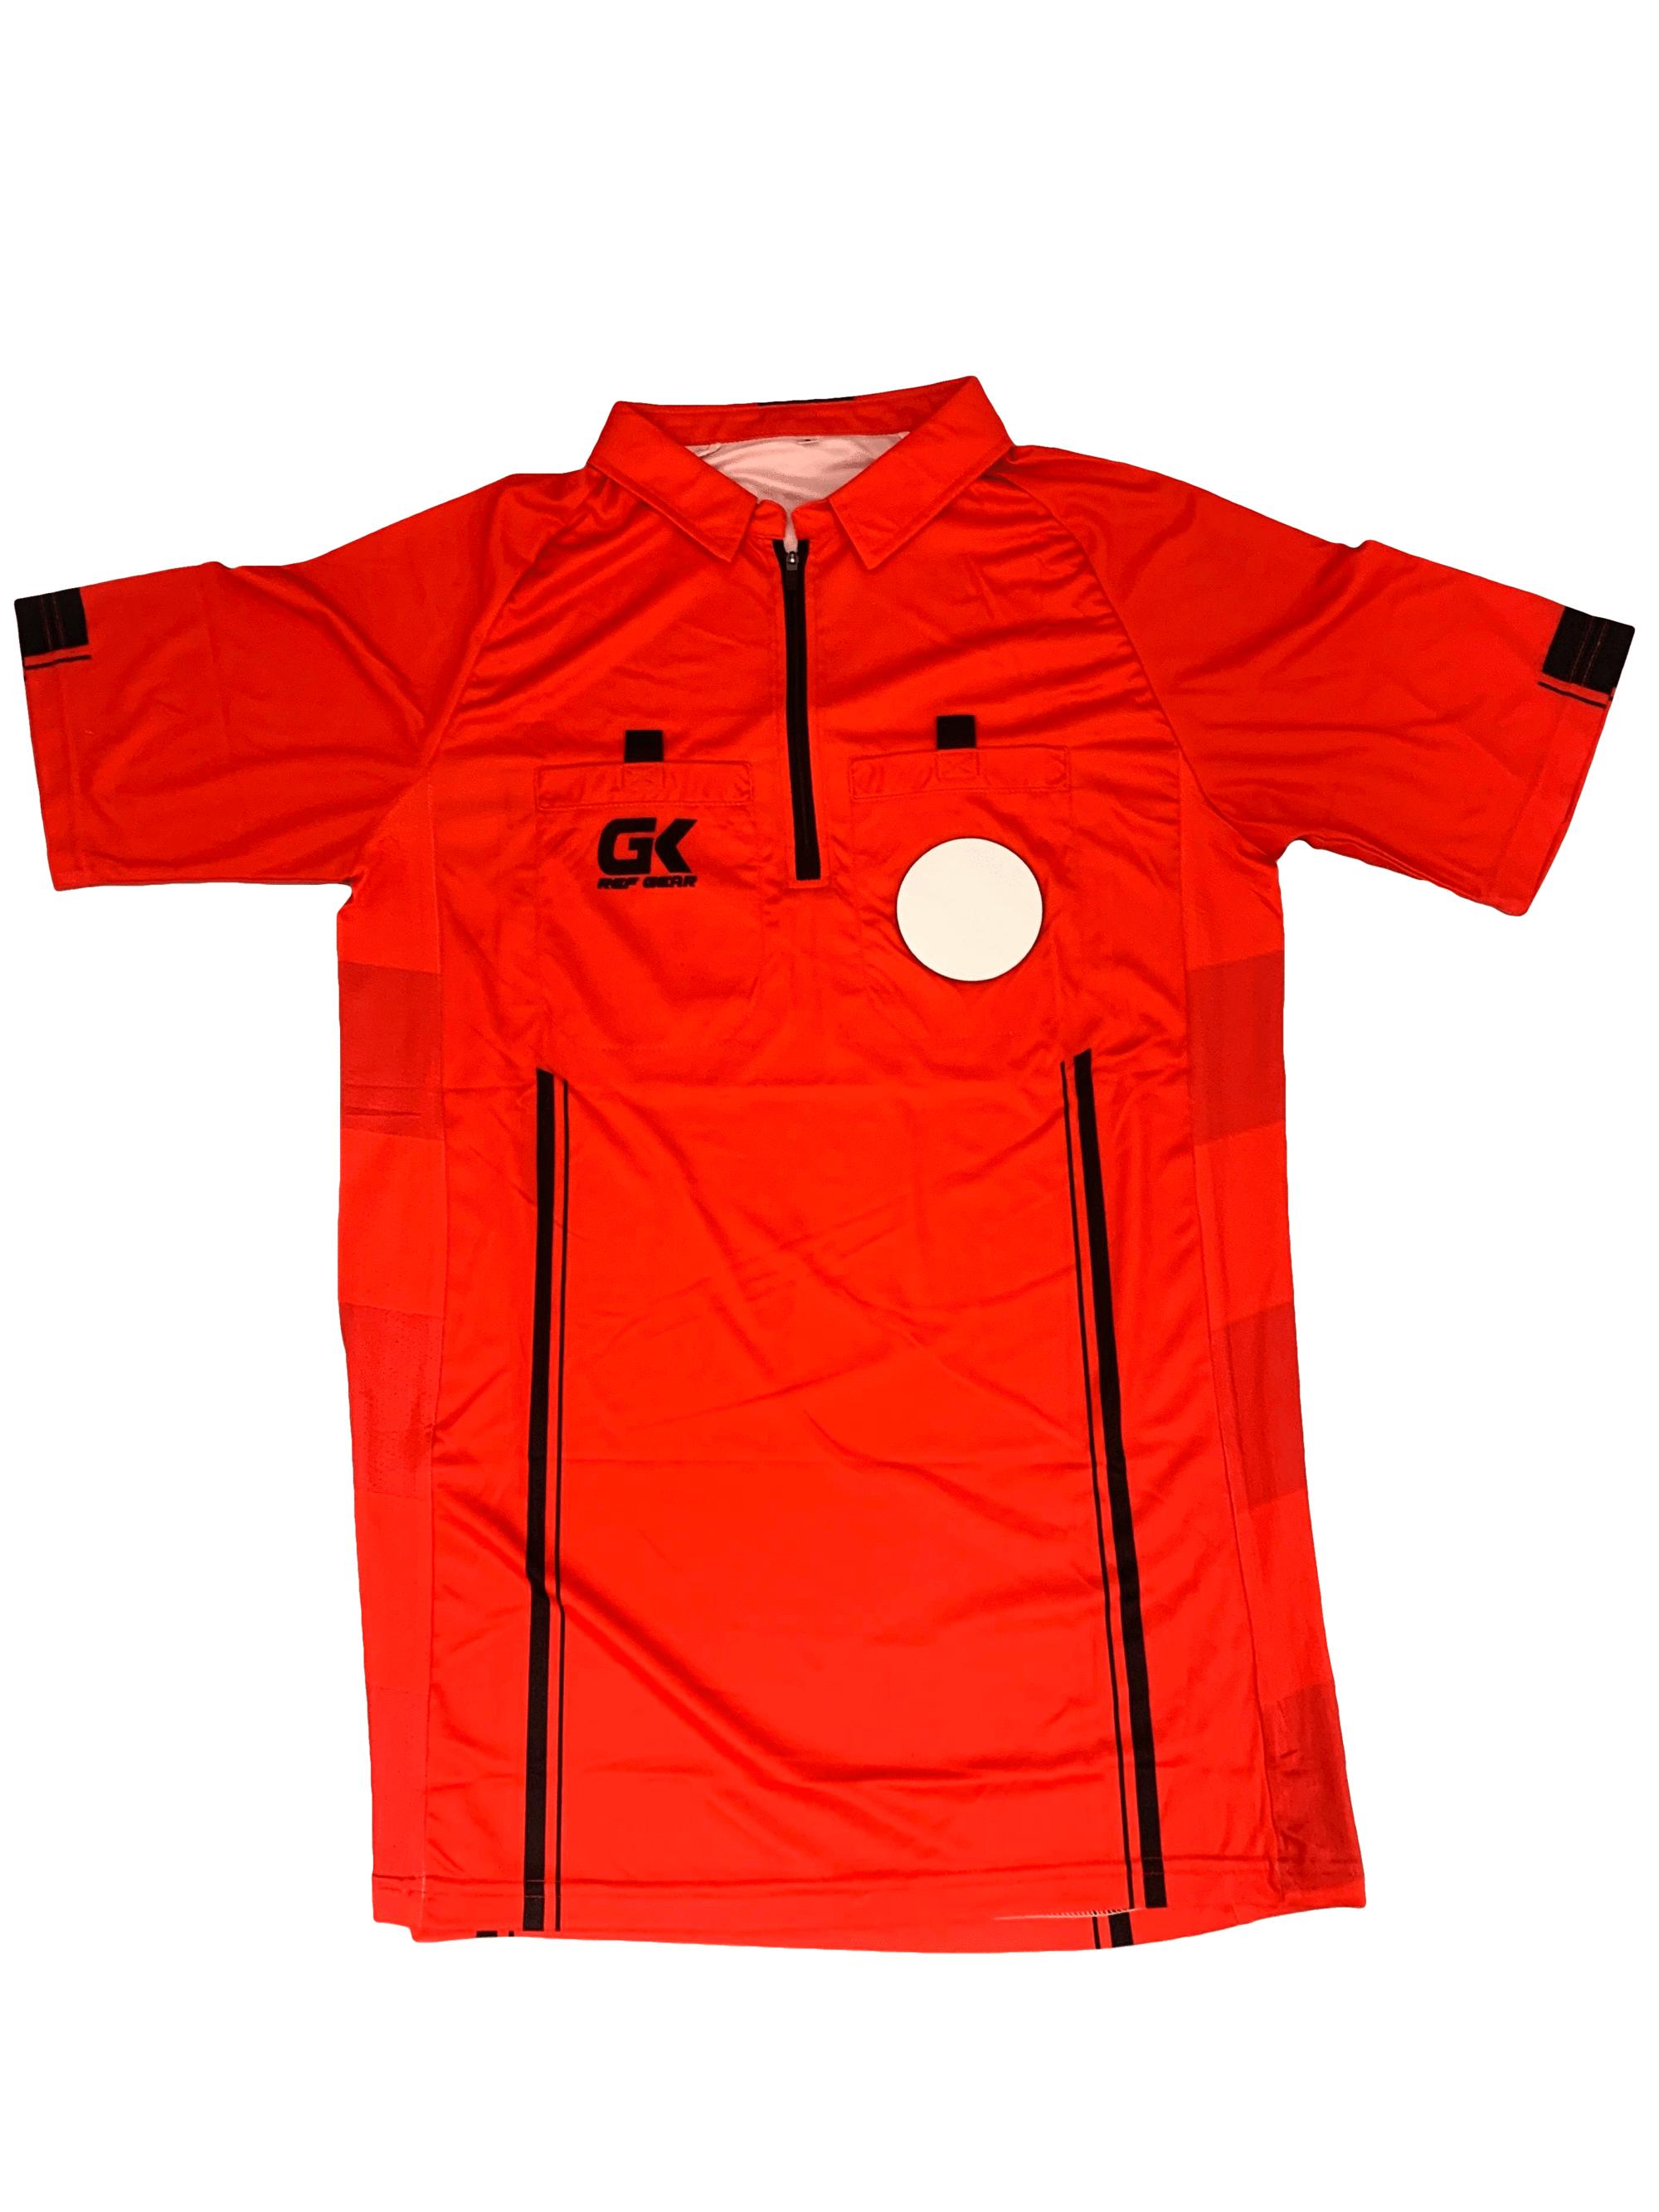 Soccer Referee Jersey Short Sleeve In 2020 Jersey Shorts Referee Shirts Referee